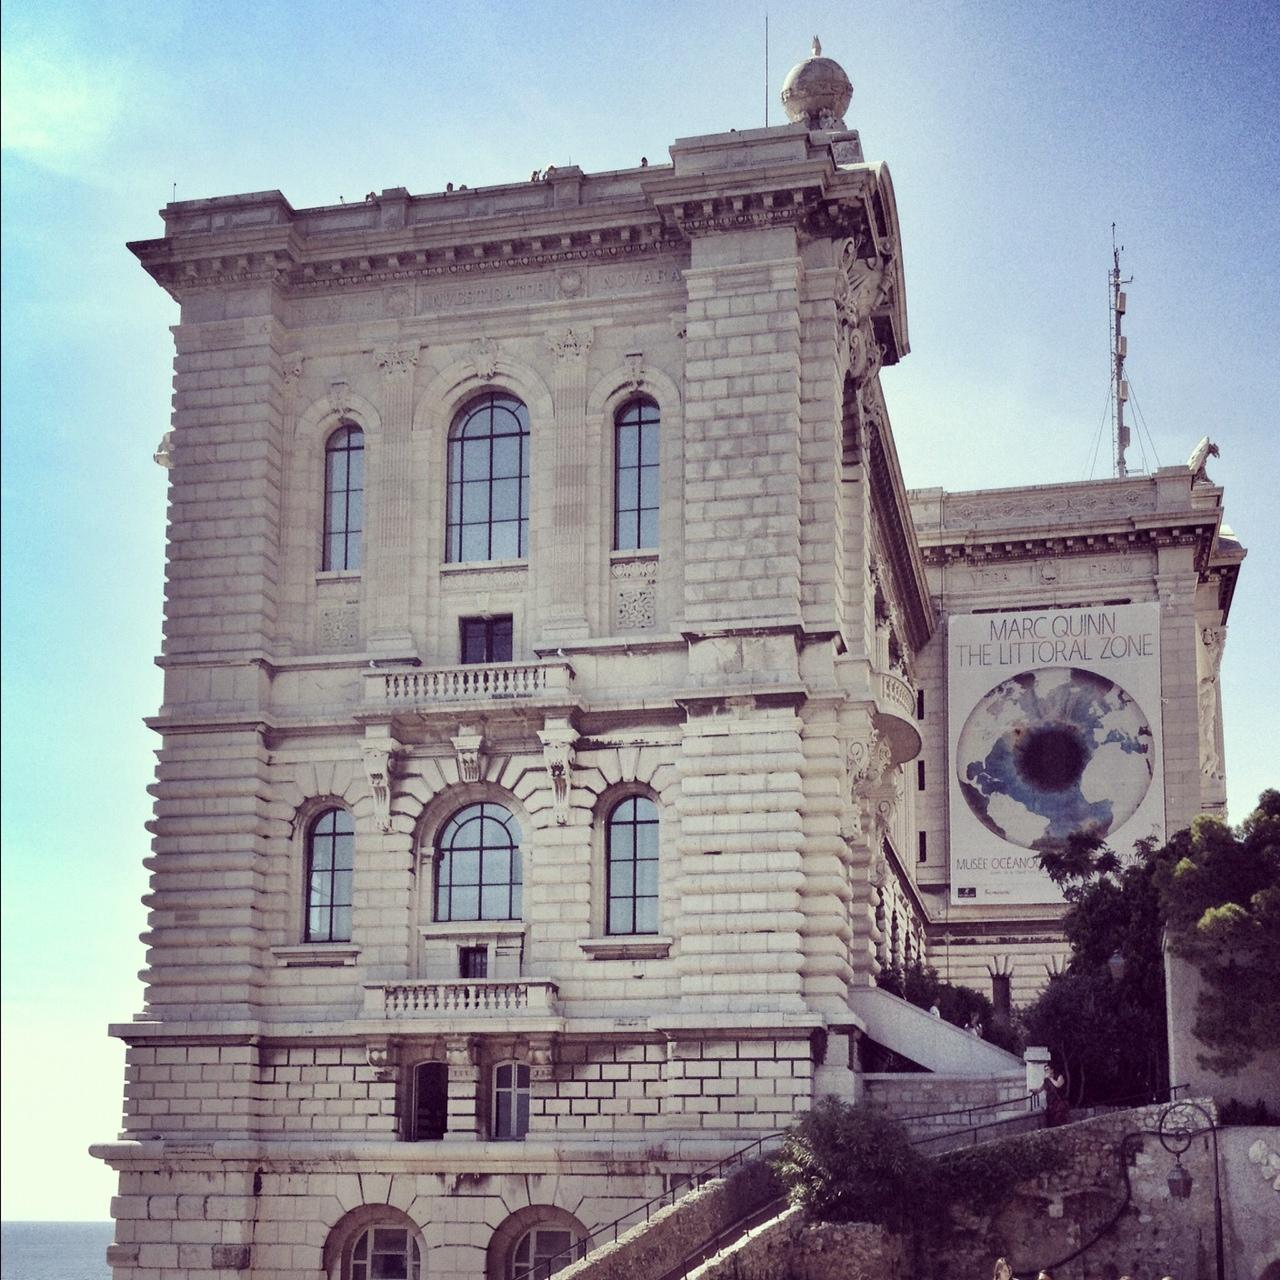 Musee Oceanographique, Musée Océanographique, Monaco, Monaco-Ville, Mediterranean Cruise, European travel, What to do in Monaco, view from Musee Oceanographique